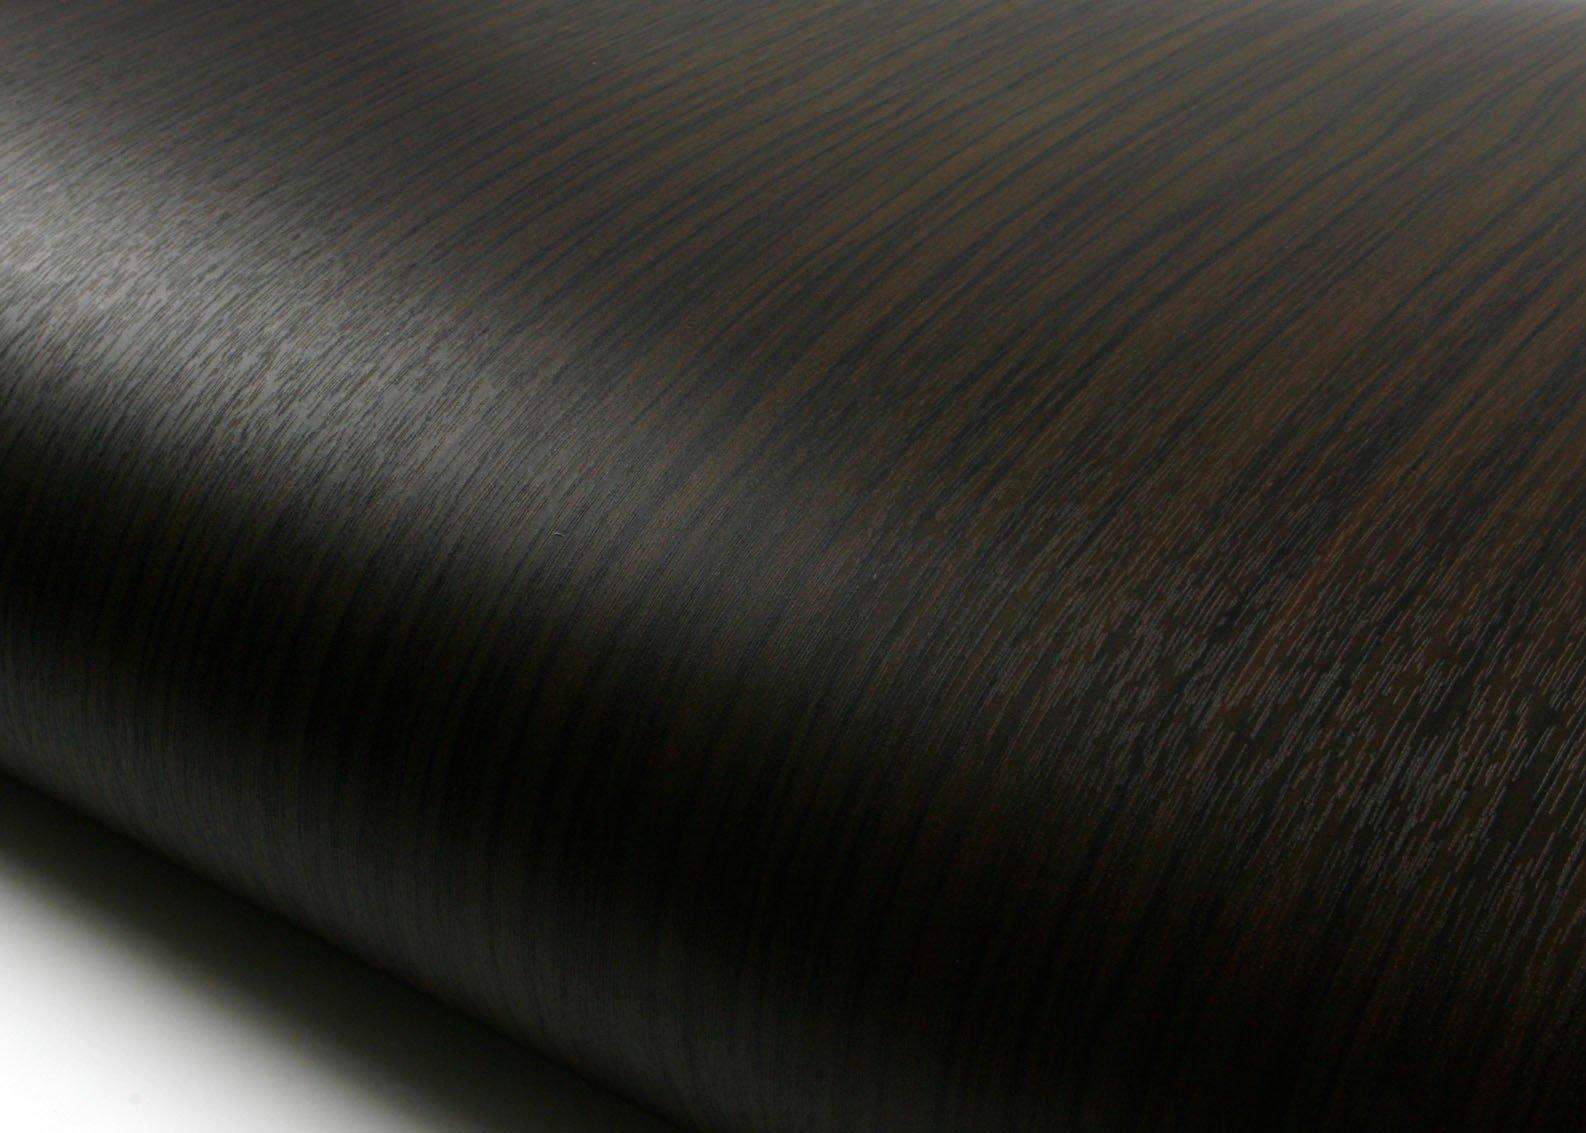 ROSEROSA Peel & Stick Acacia Merbau Camagon Amazahoue Crack Wood Textured Self-Adhesive Vinyl Contact paper Interior Film Shelf Liner Table and Door Reform (PF4126-2 : 2.00 Feet X 6.56 Feet)